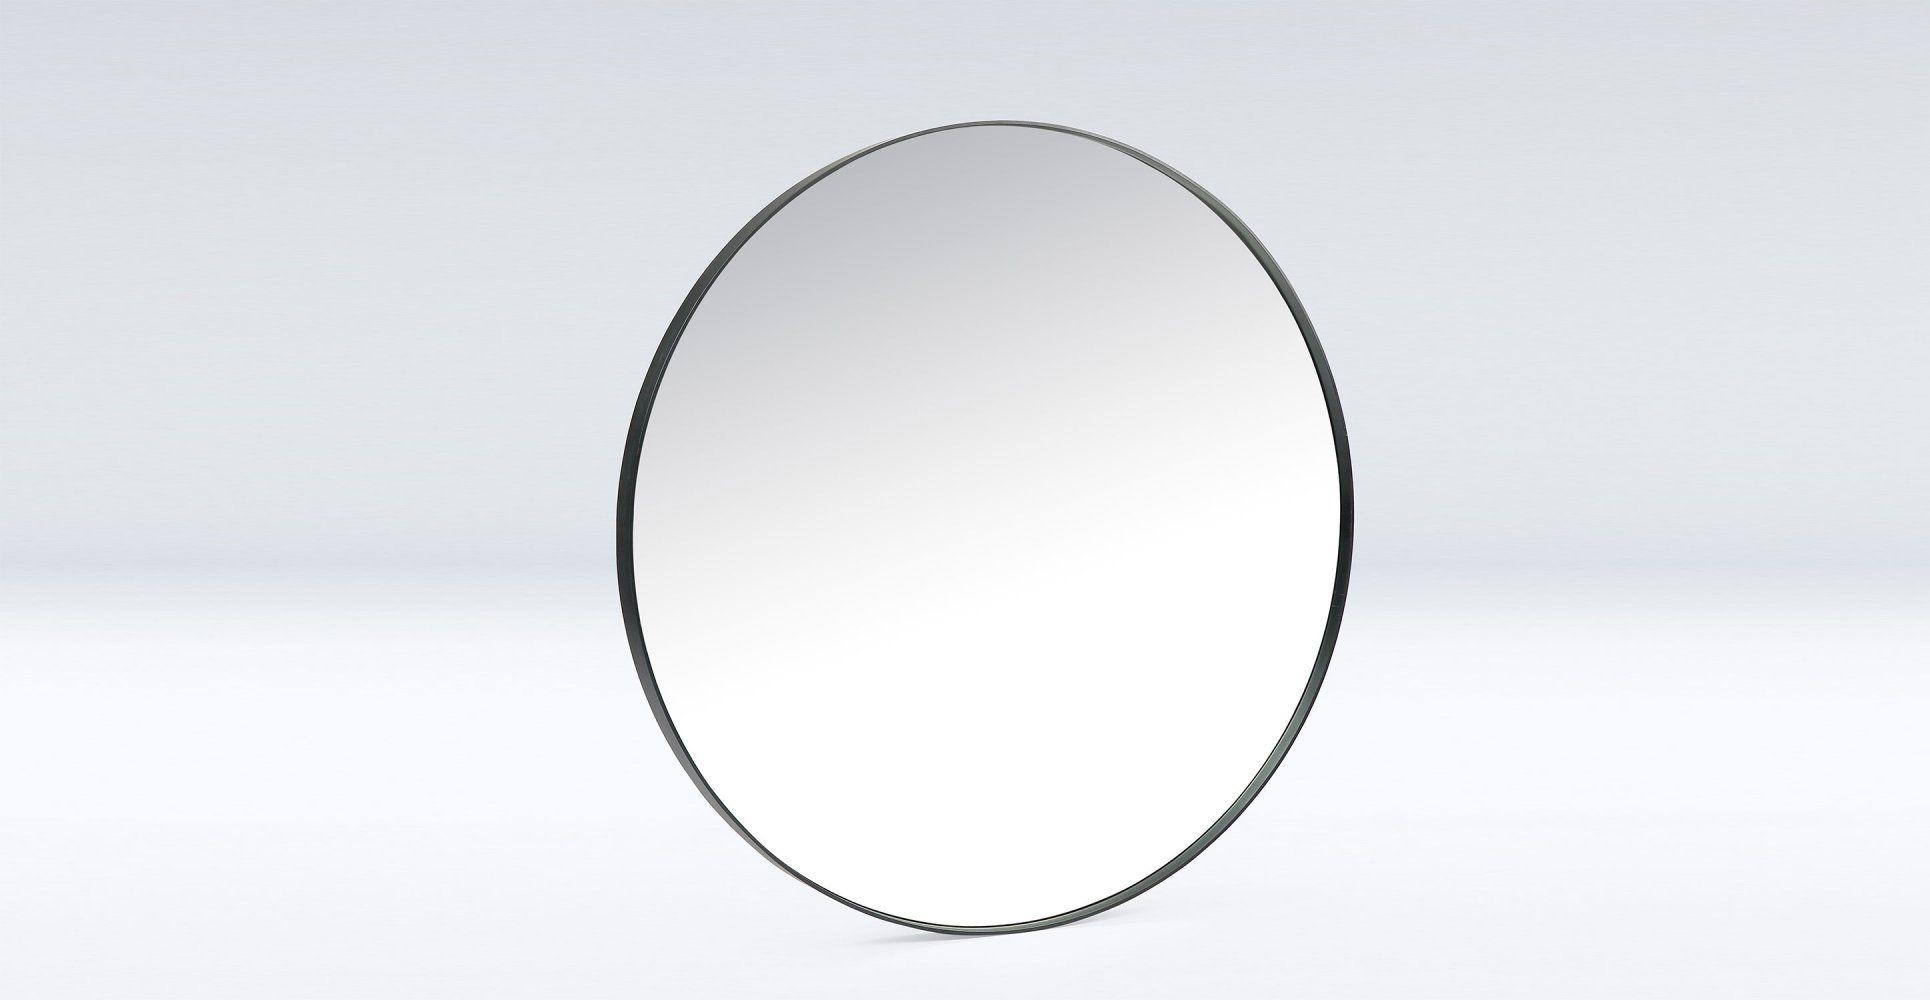 Grand miroir mural rond en métal noir diam¨tre 100cm